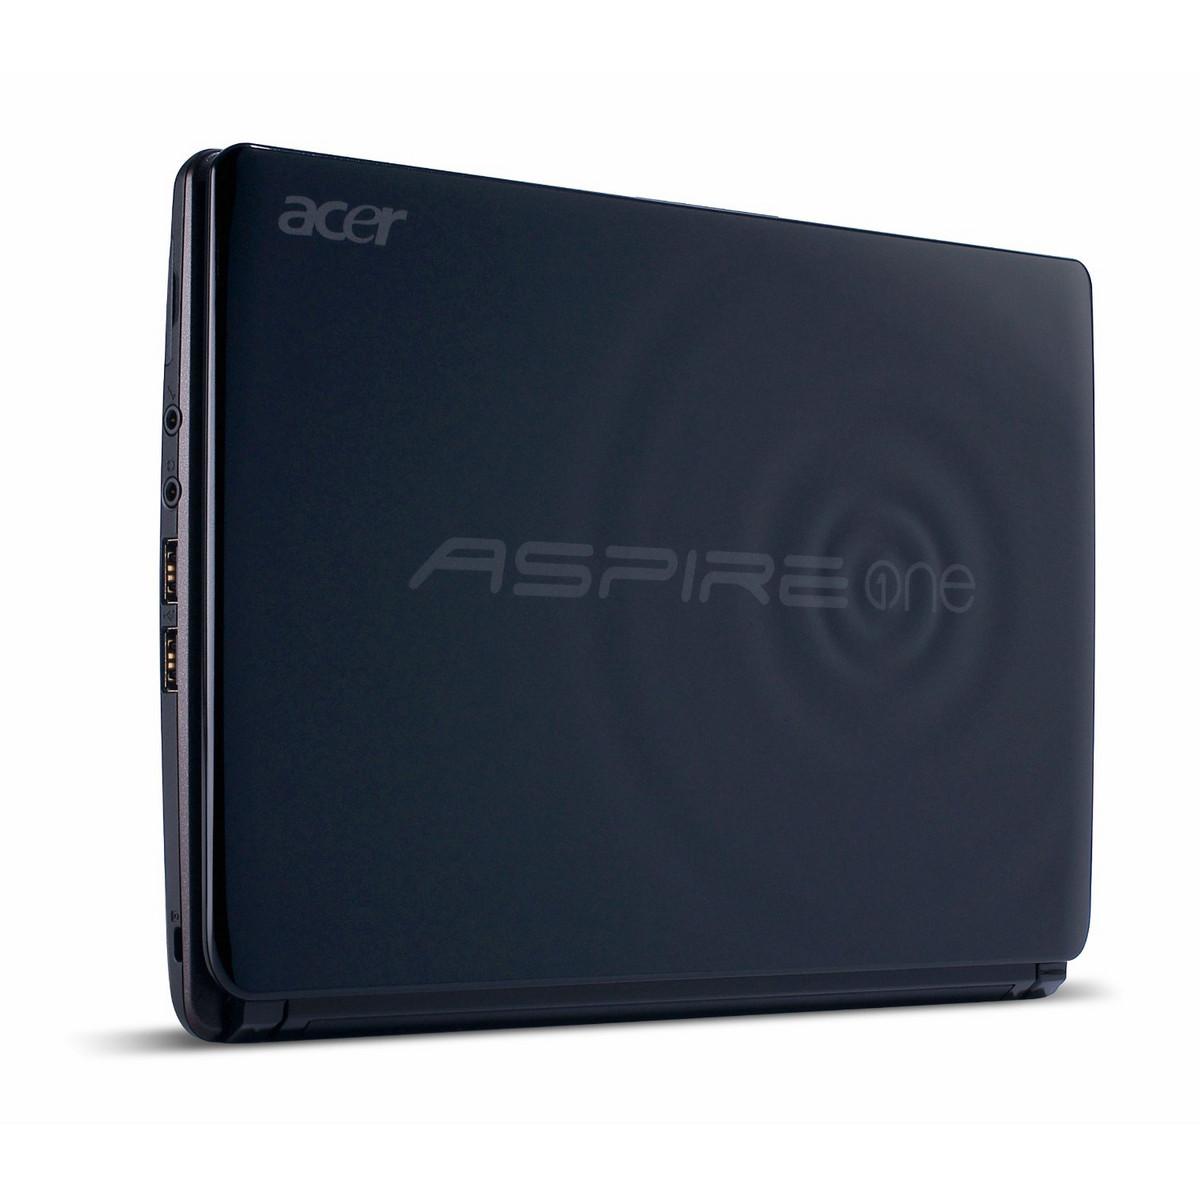 Acer Aspire One 722 BZ454